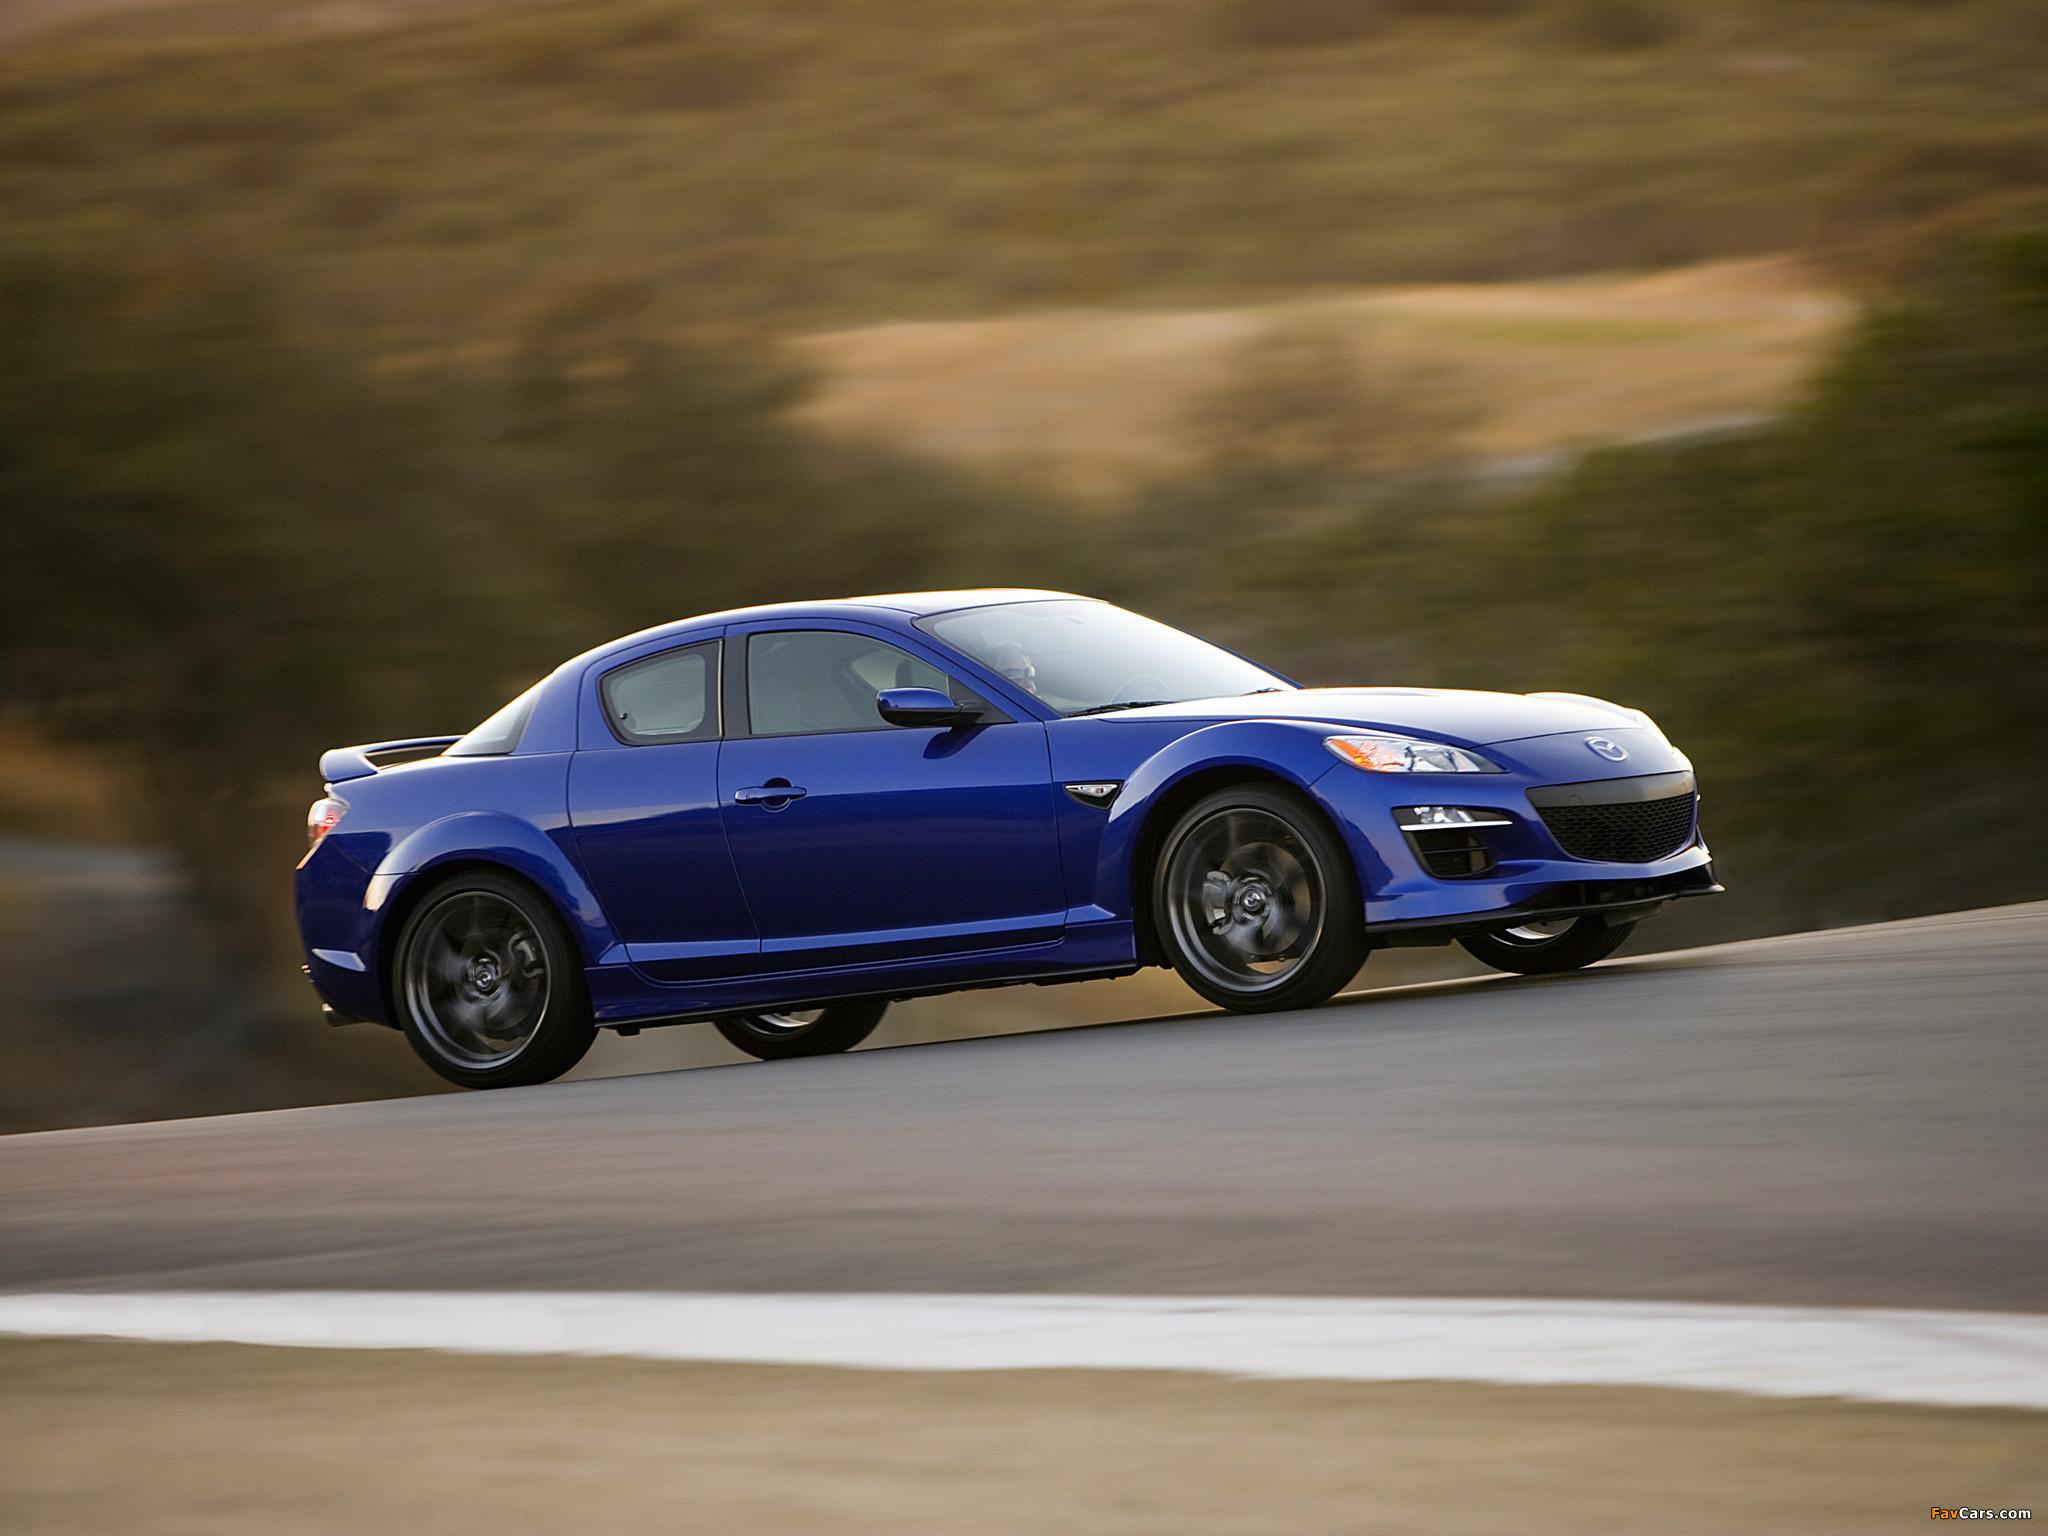 Mazda RX-8 электромобиль бесплатно